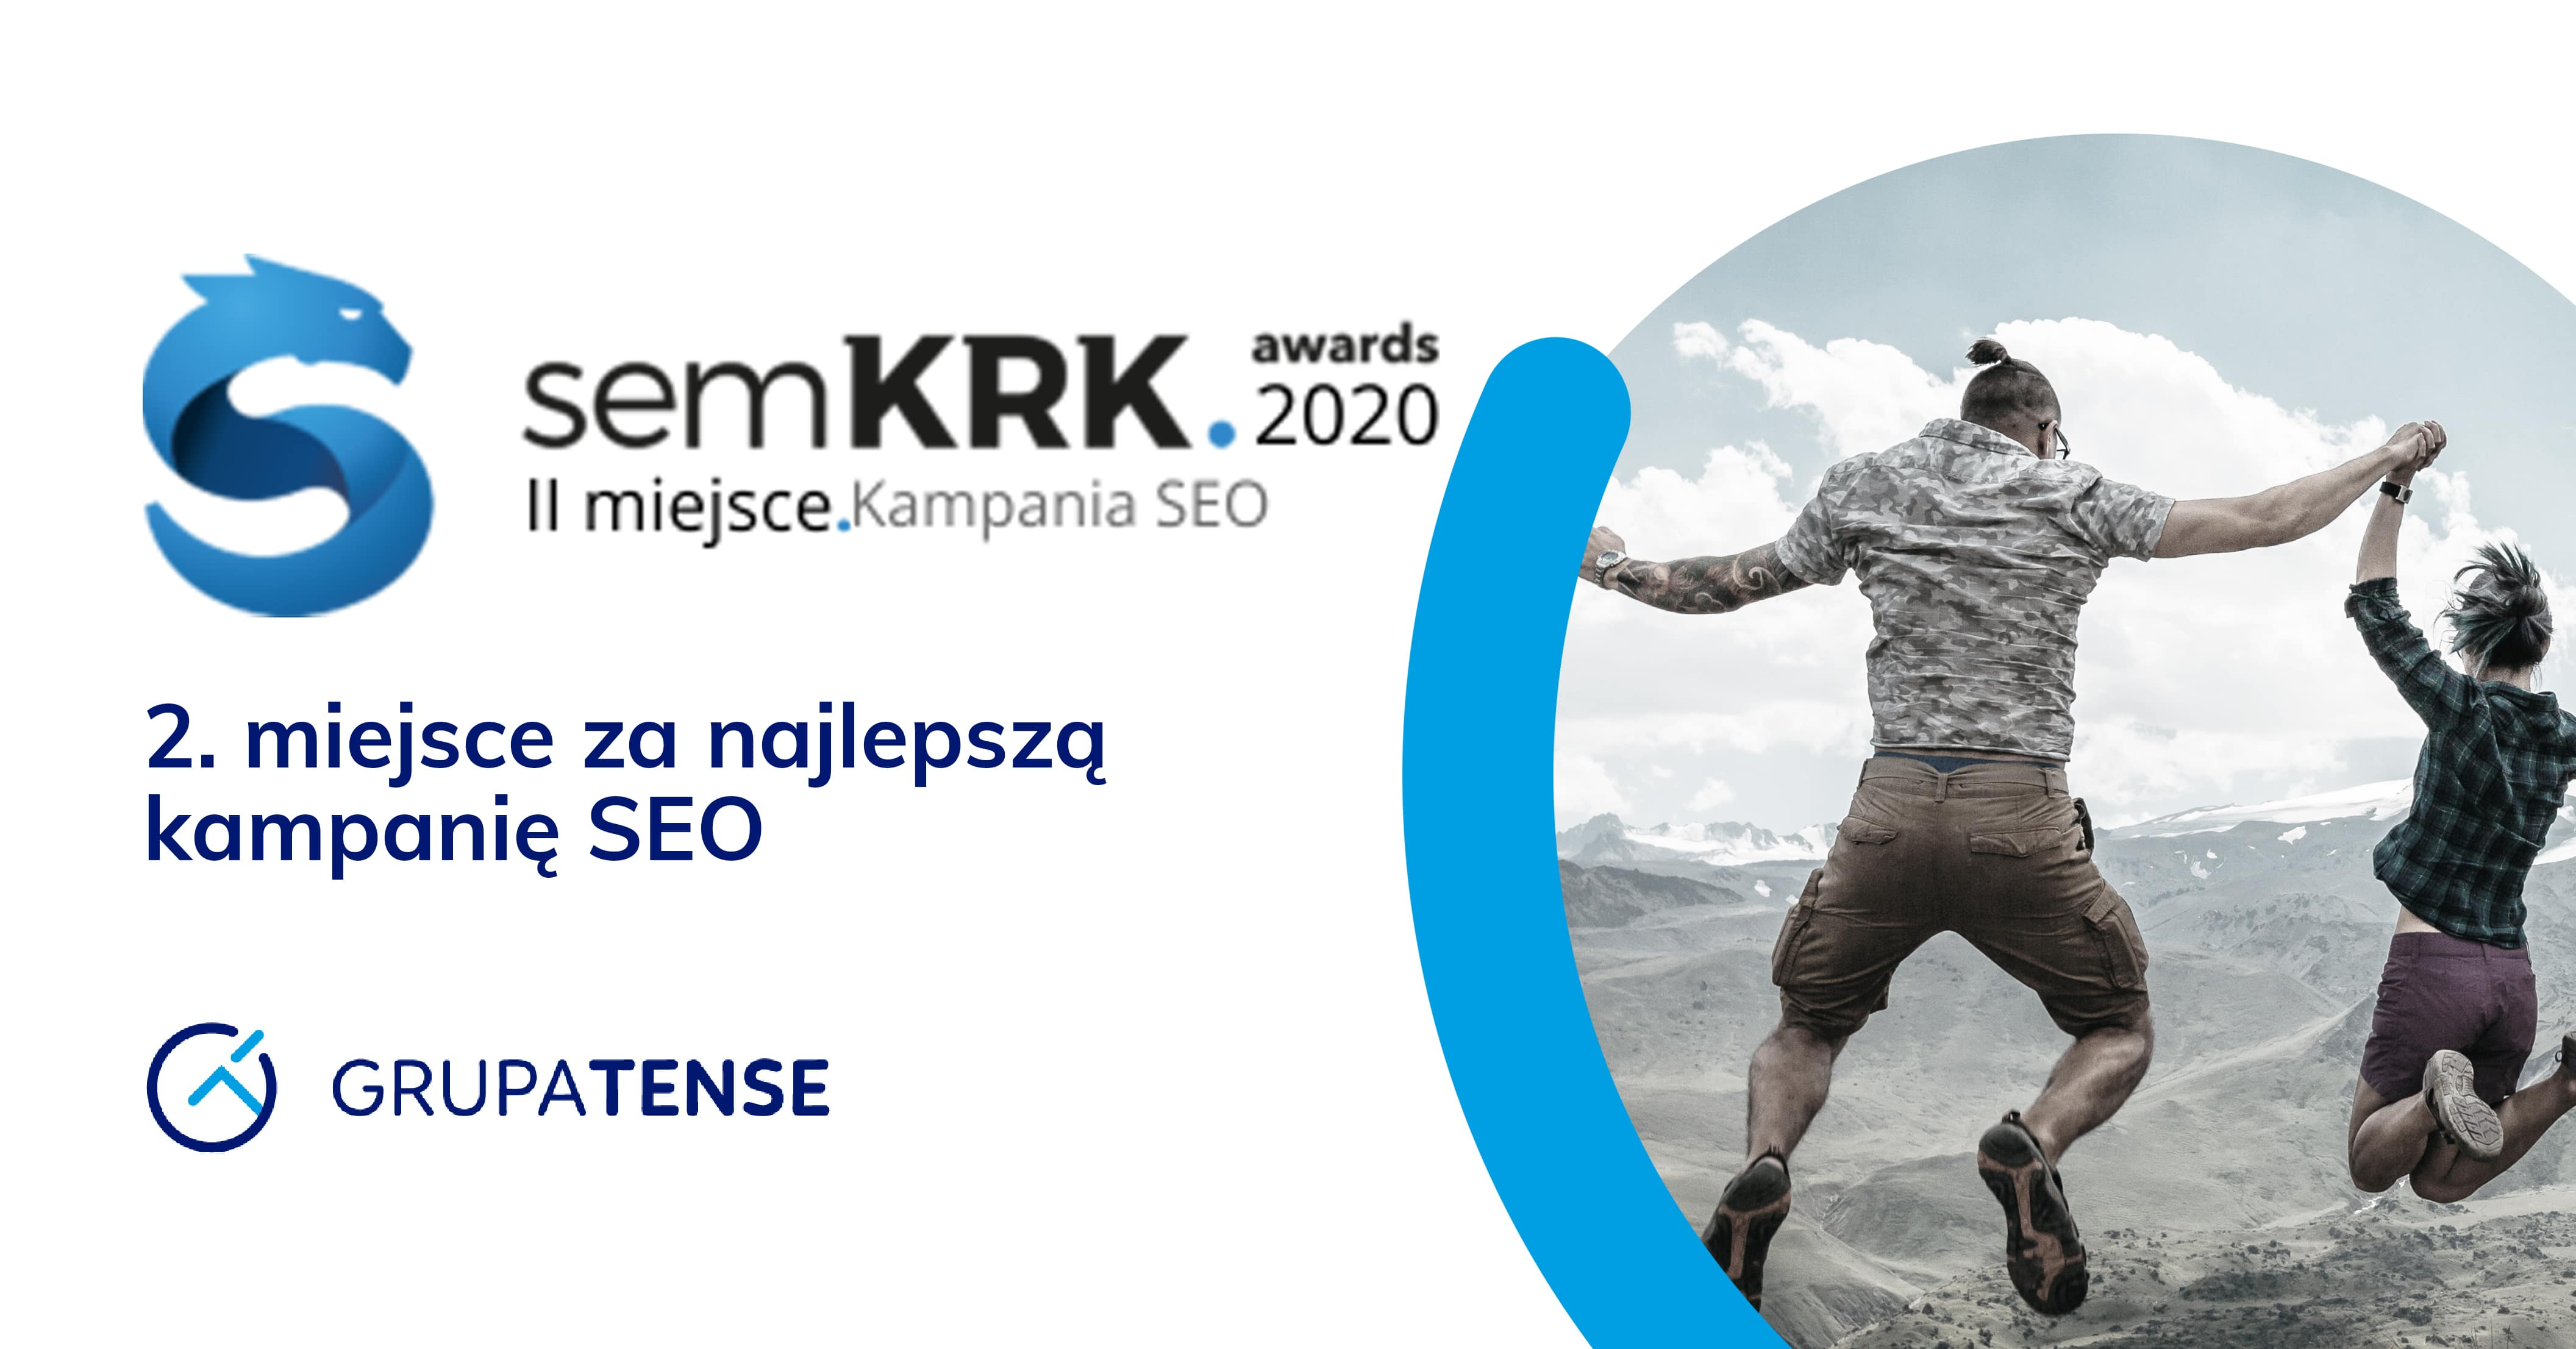 Grupa TENSE zajmuje drugie miejsce w semKRK Awards